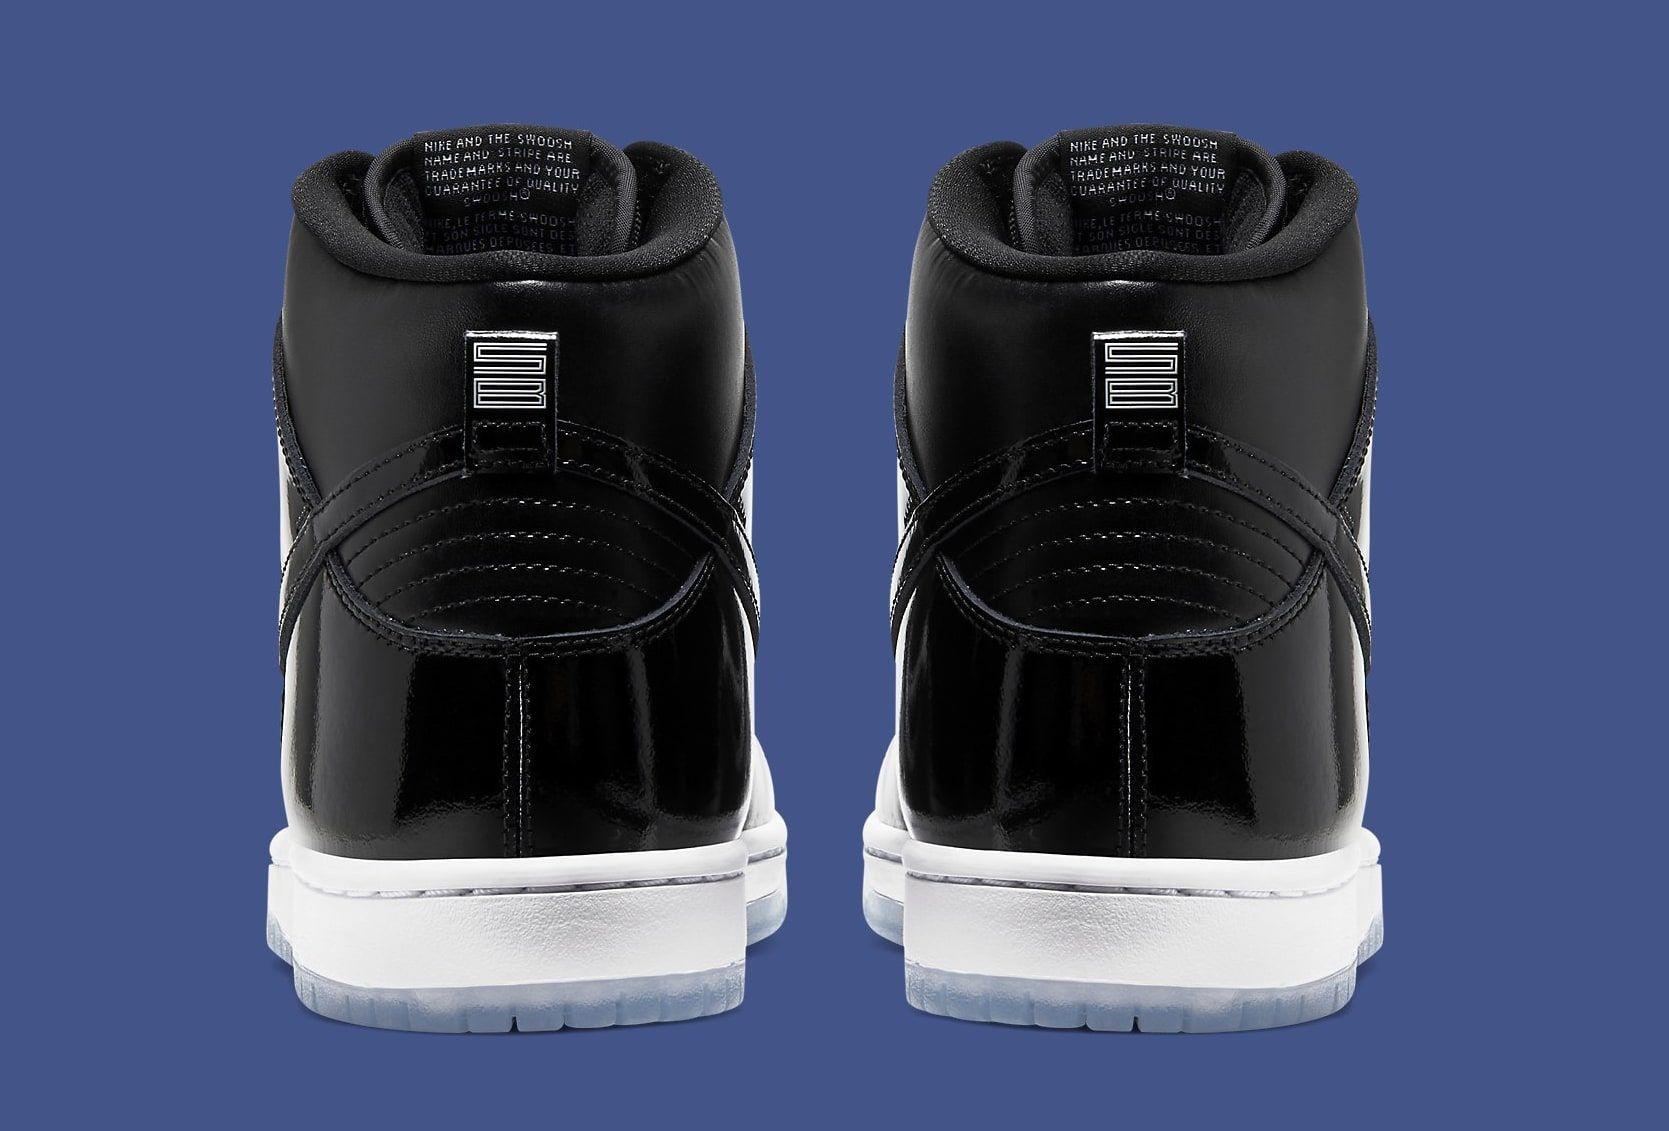 Nike SB Dunk High 'Space Jam' Release